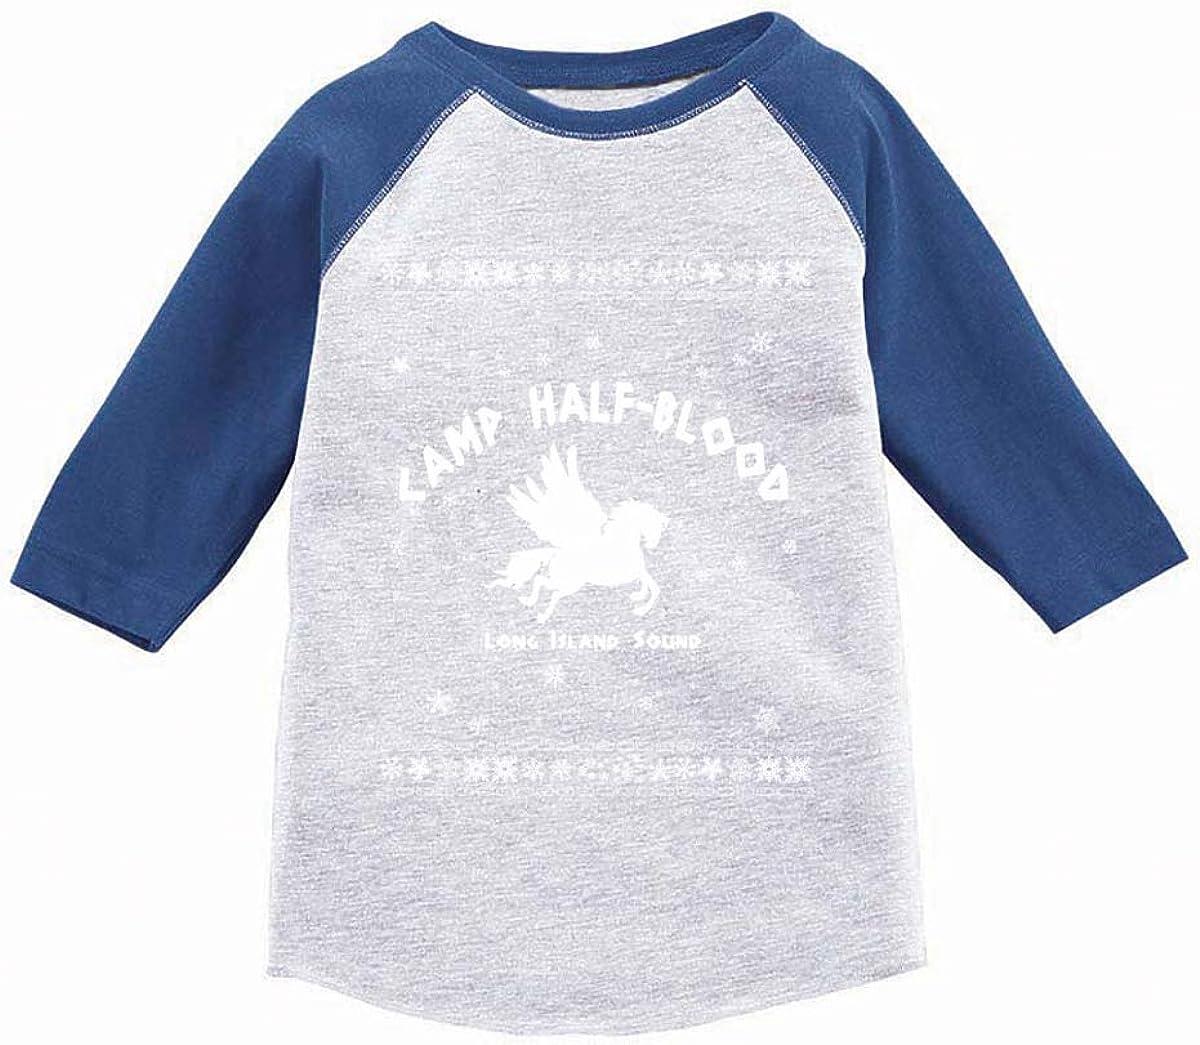 Awkward Styles Boys Girls Ugly Xmas T-Shirt Christmas Camp Half-Blood Toddler Raglan Shirt